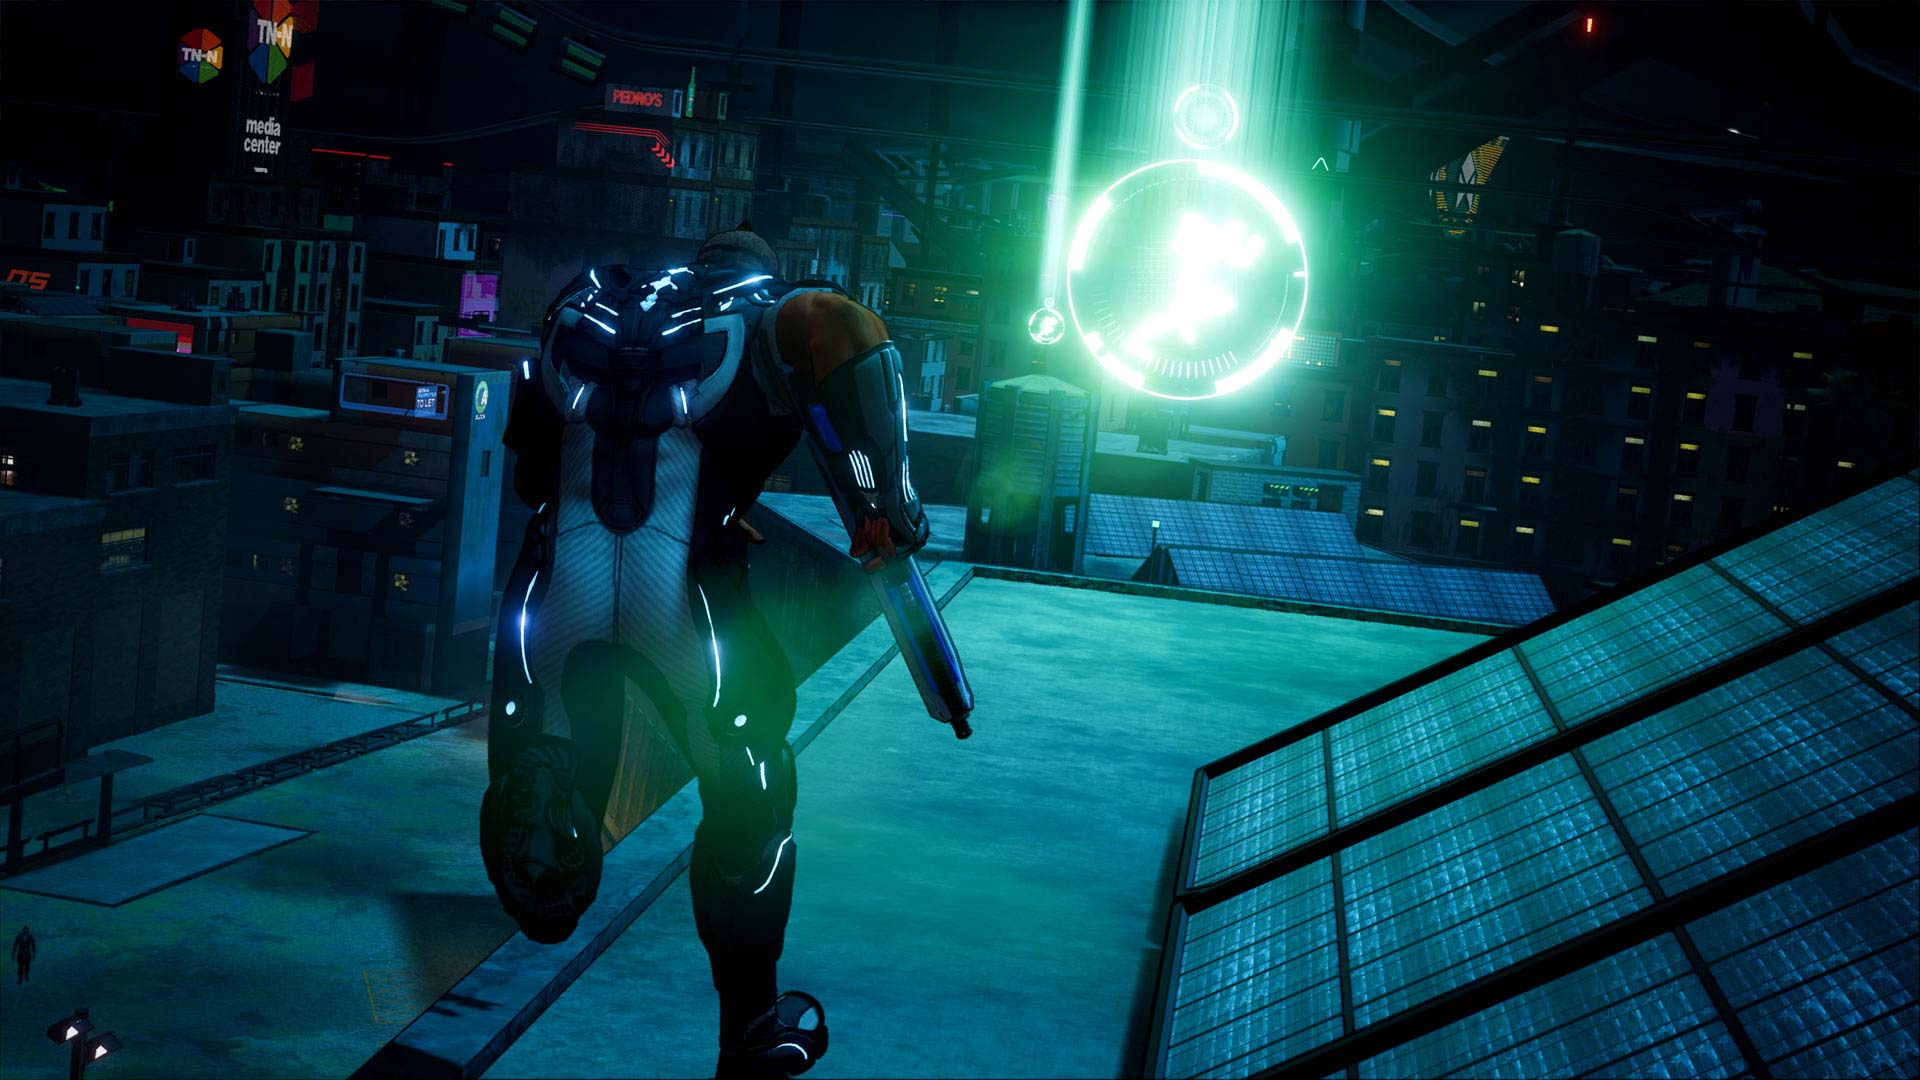 Crackdown 3 Xbox One X Screenshot